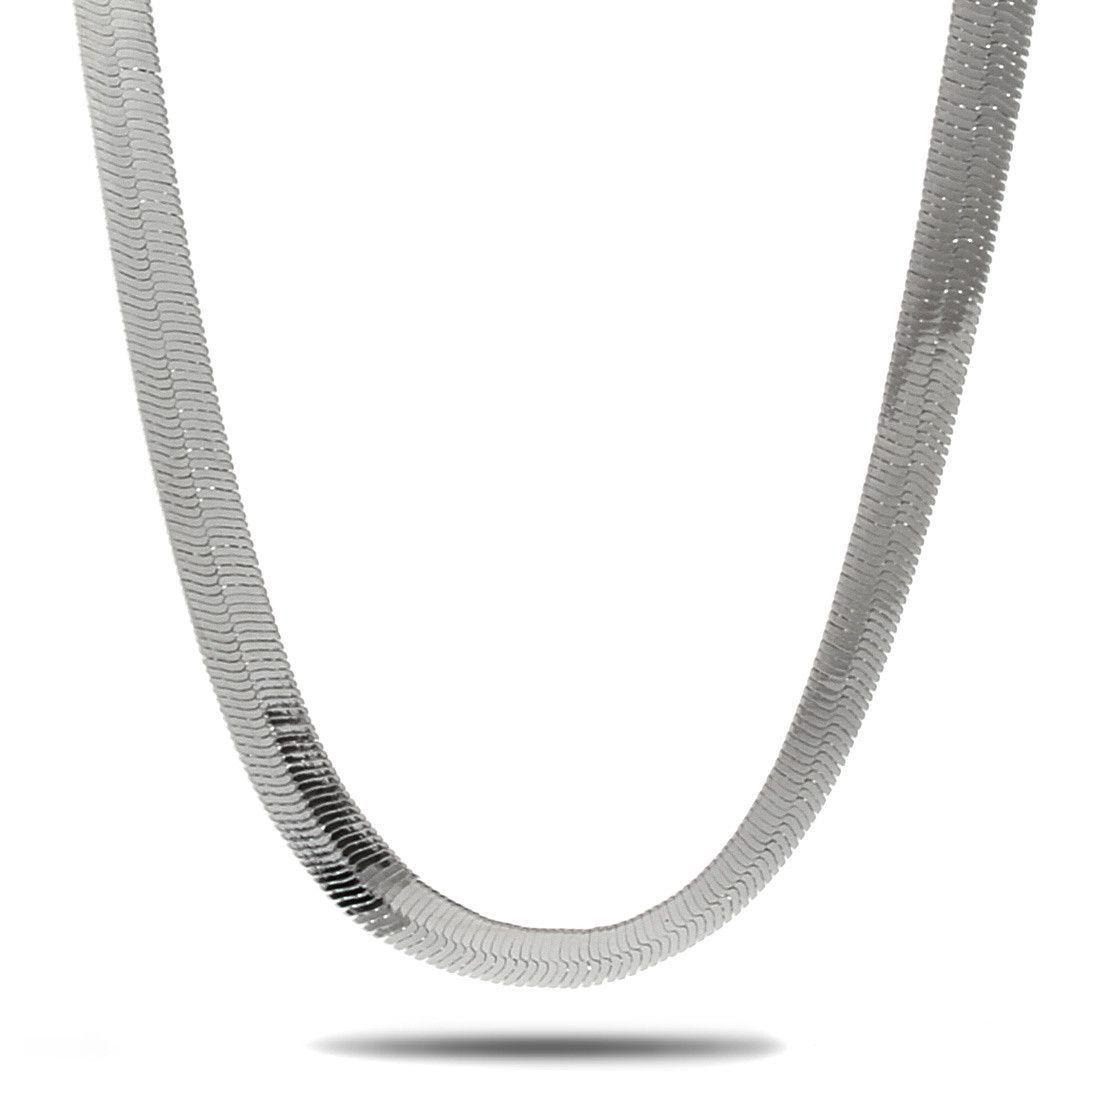 Gt hurleyburley man gt sterling silver men s snake chain bracelet - Gt Hurleyburley Man Gt Sterling Silver Men S Snake Chain Bracelet 33